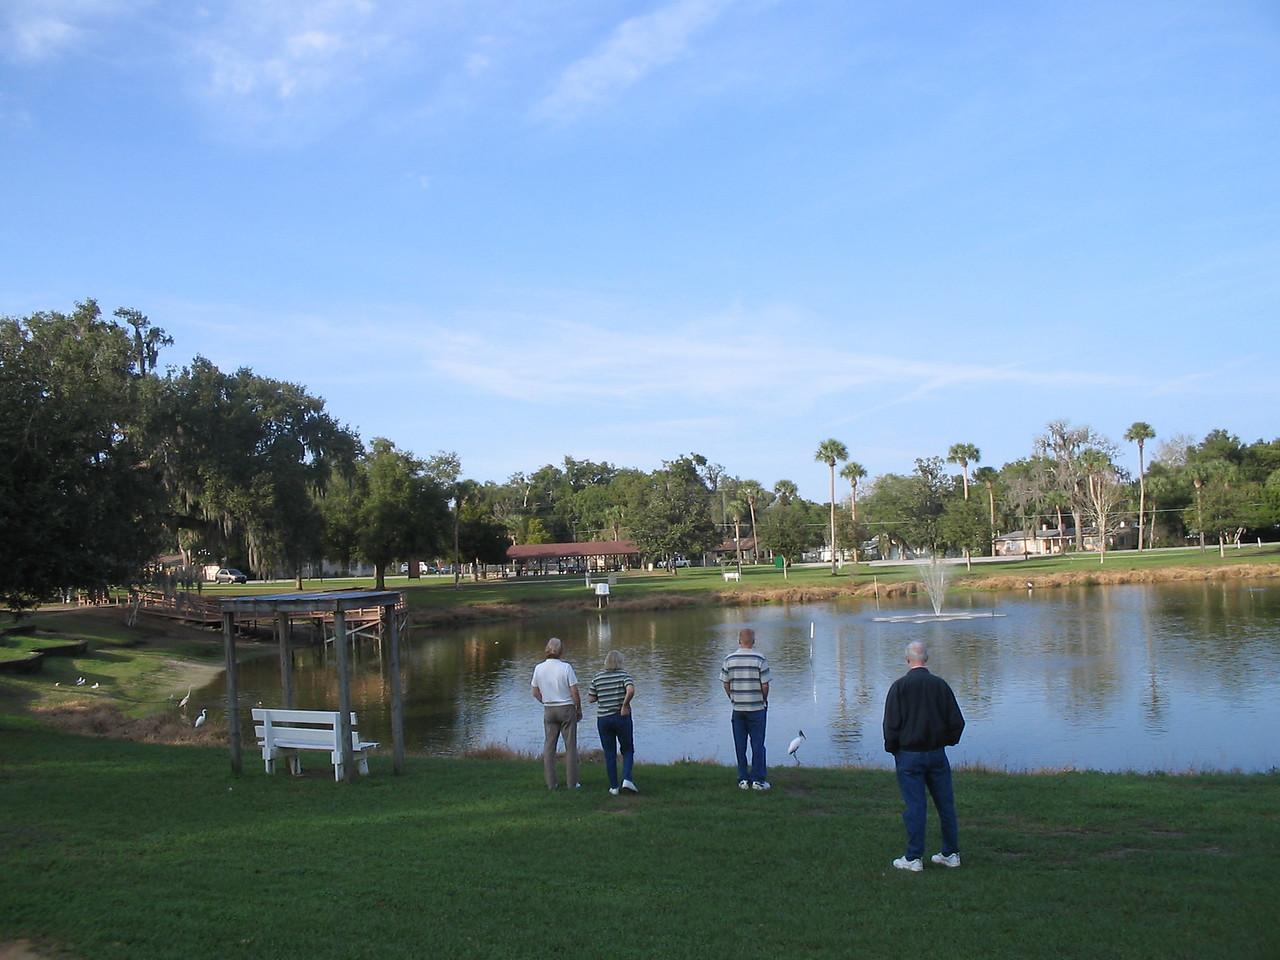 Folks enjoying Lake Lillian in downtown Belleview<br /> PHOTO CREDIT: Florida Trail Association / Sandra Friend